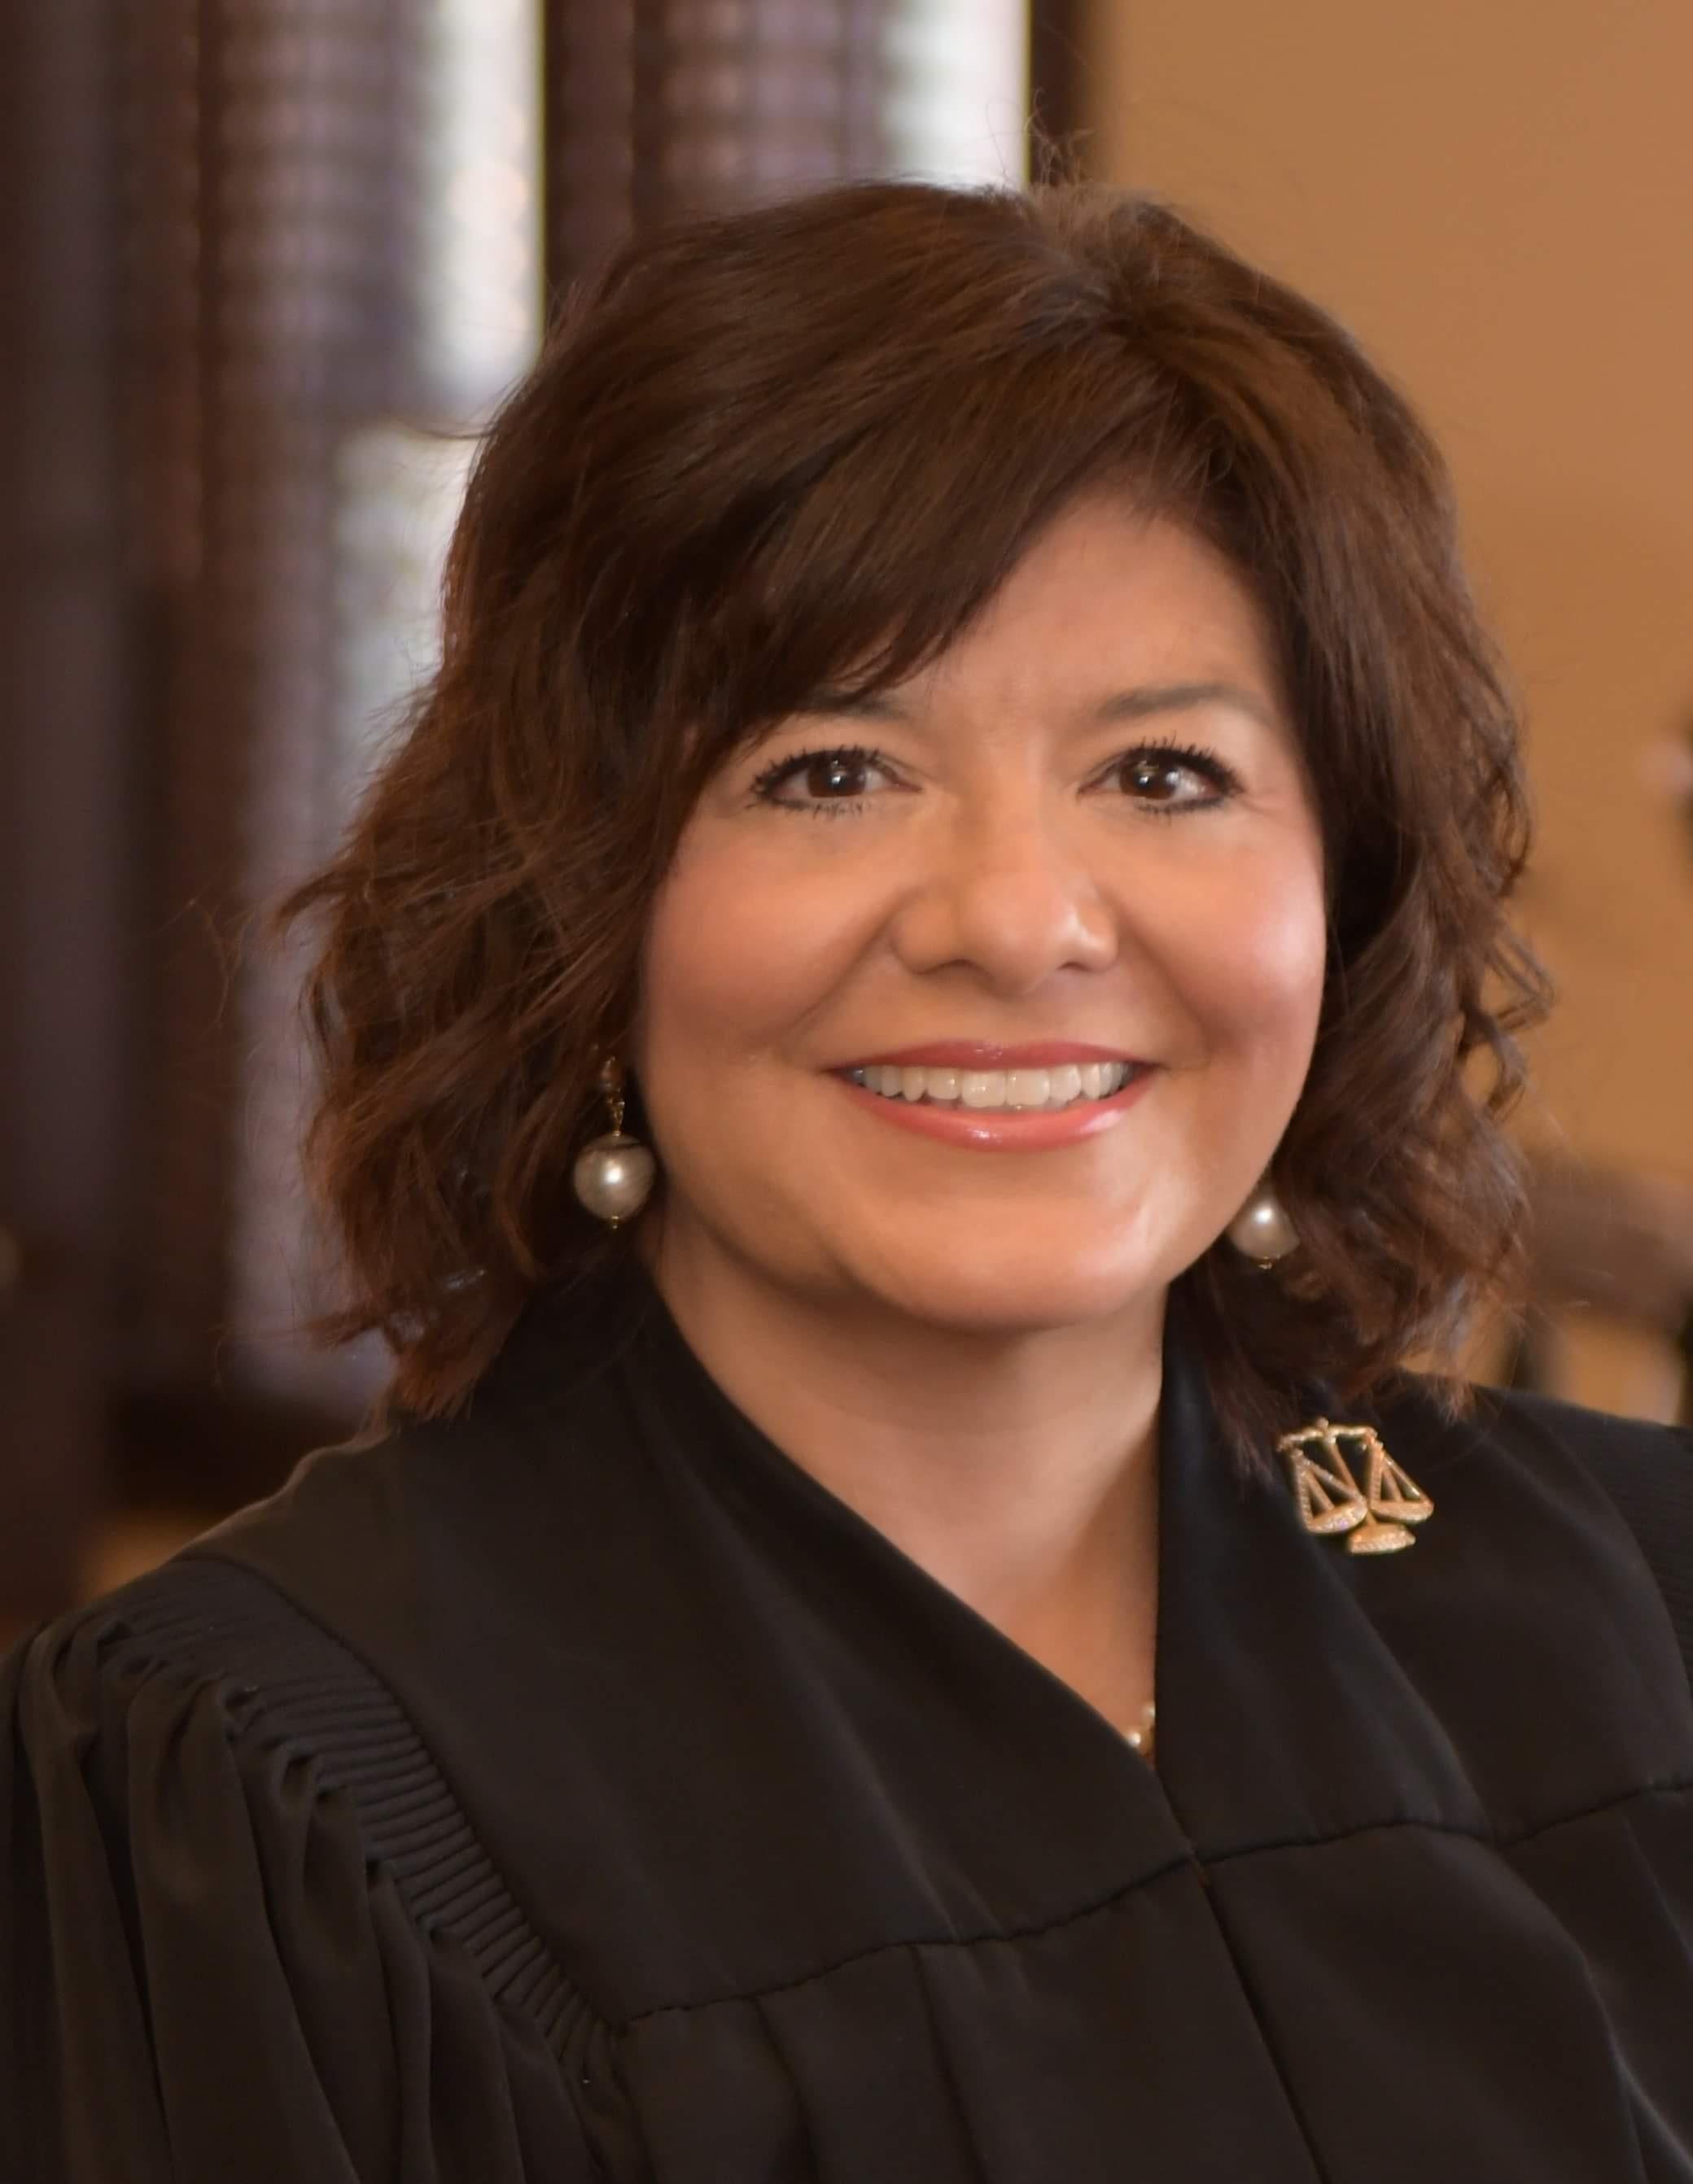 Photo of Justice Lori I. Valenzuela